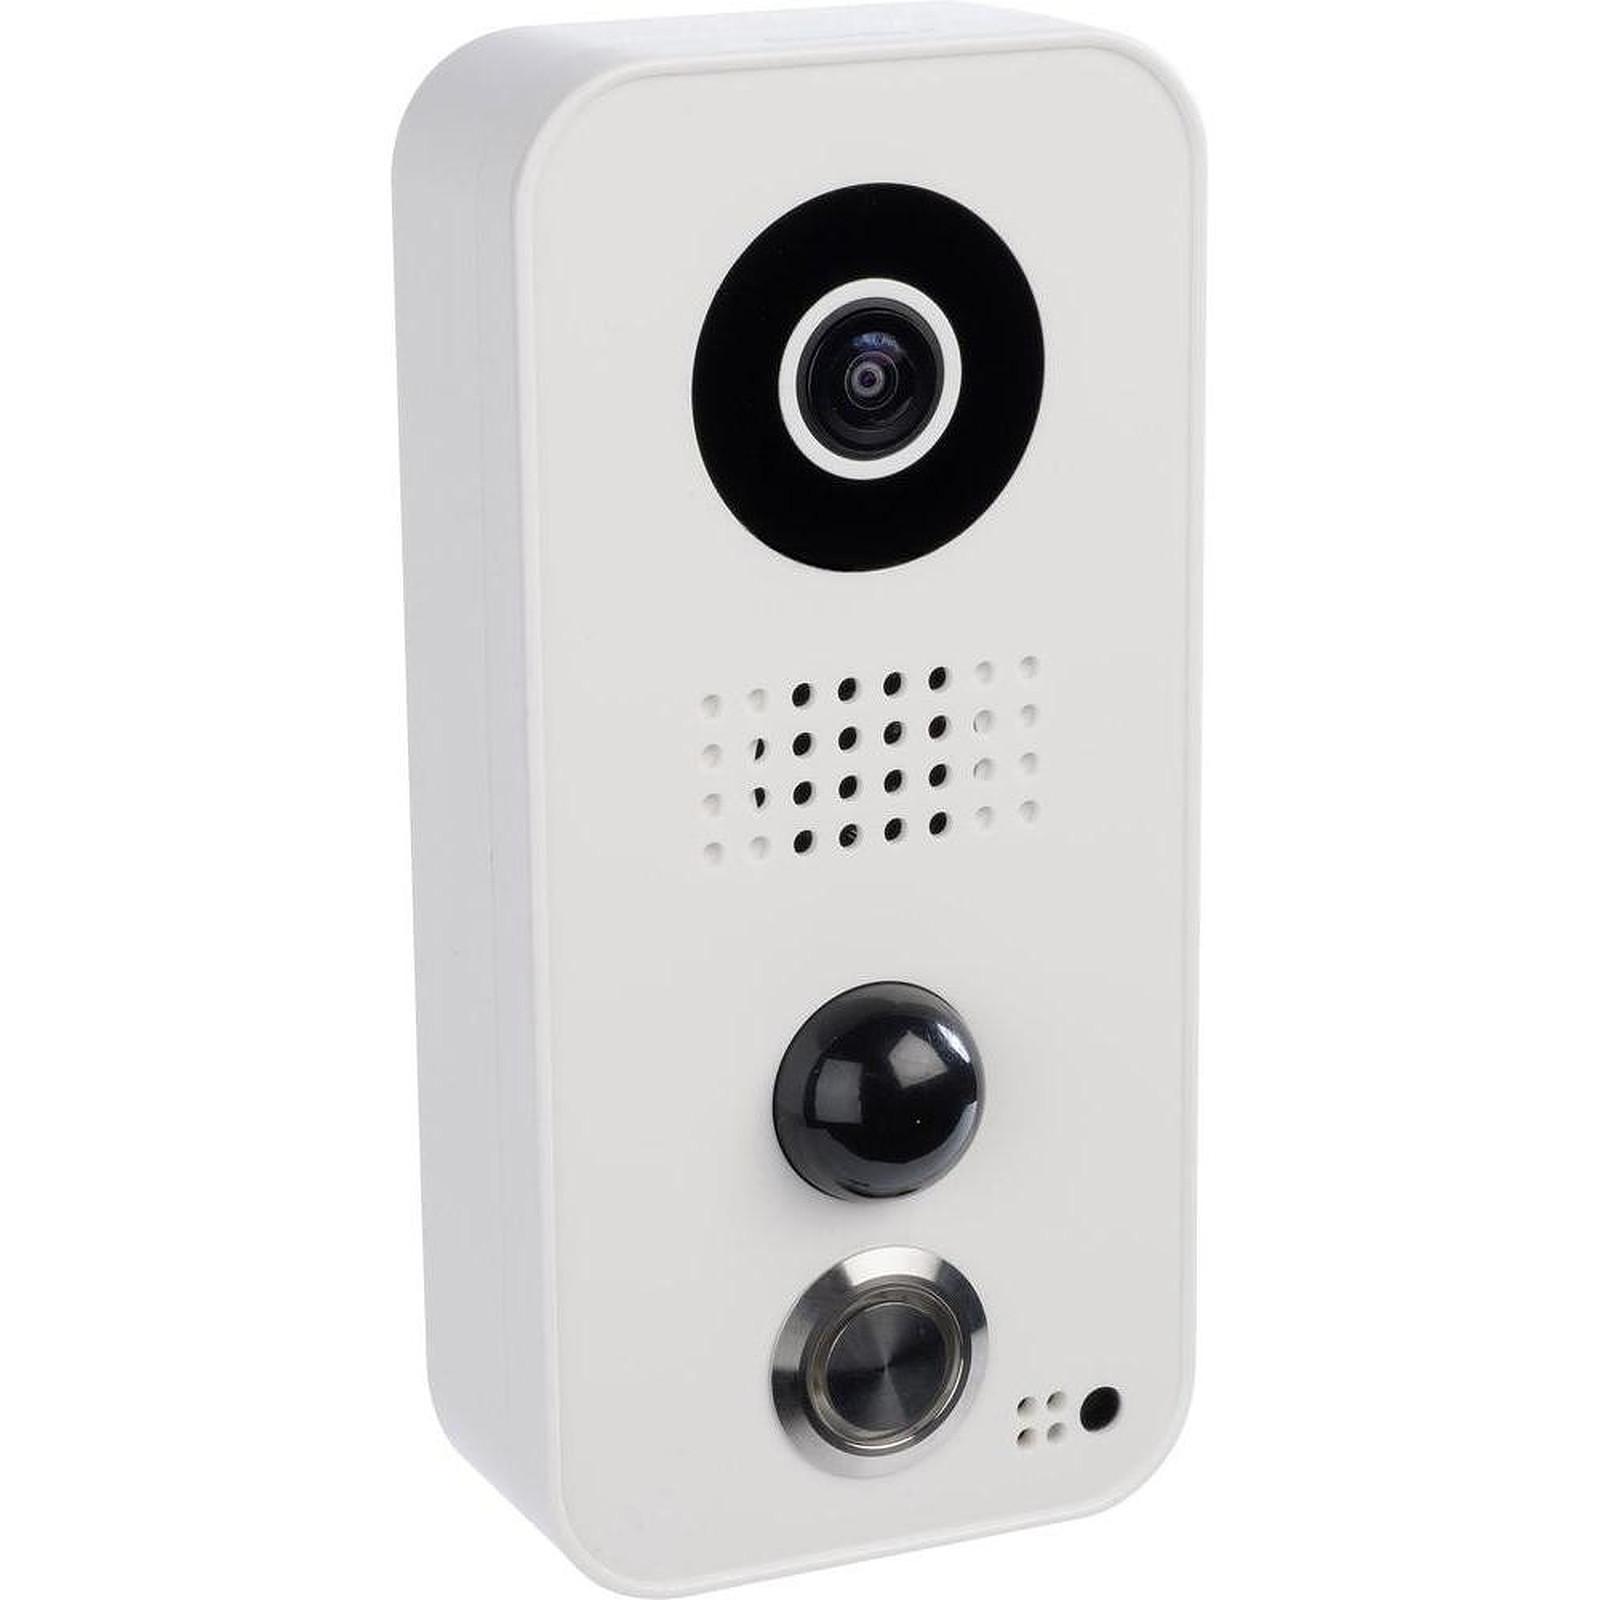 DoorBird Portier Vidéo Connecté Wifi Et Hd D101 DOO_D101